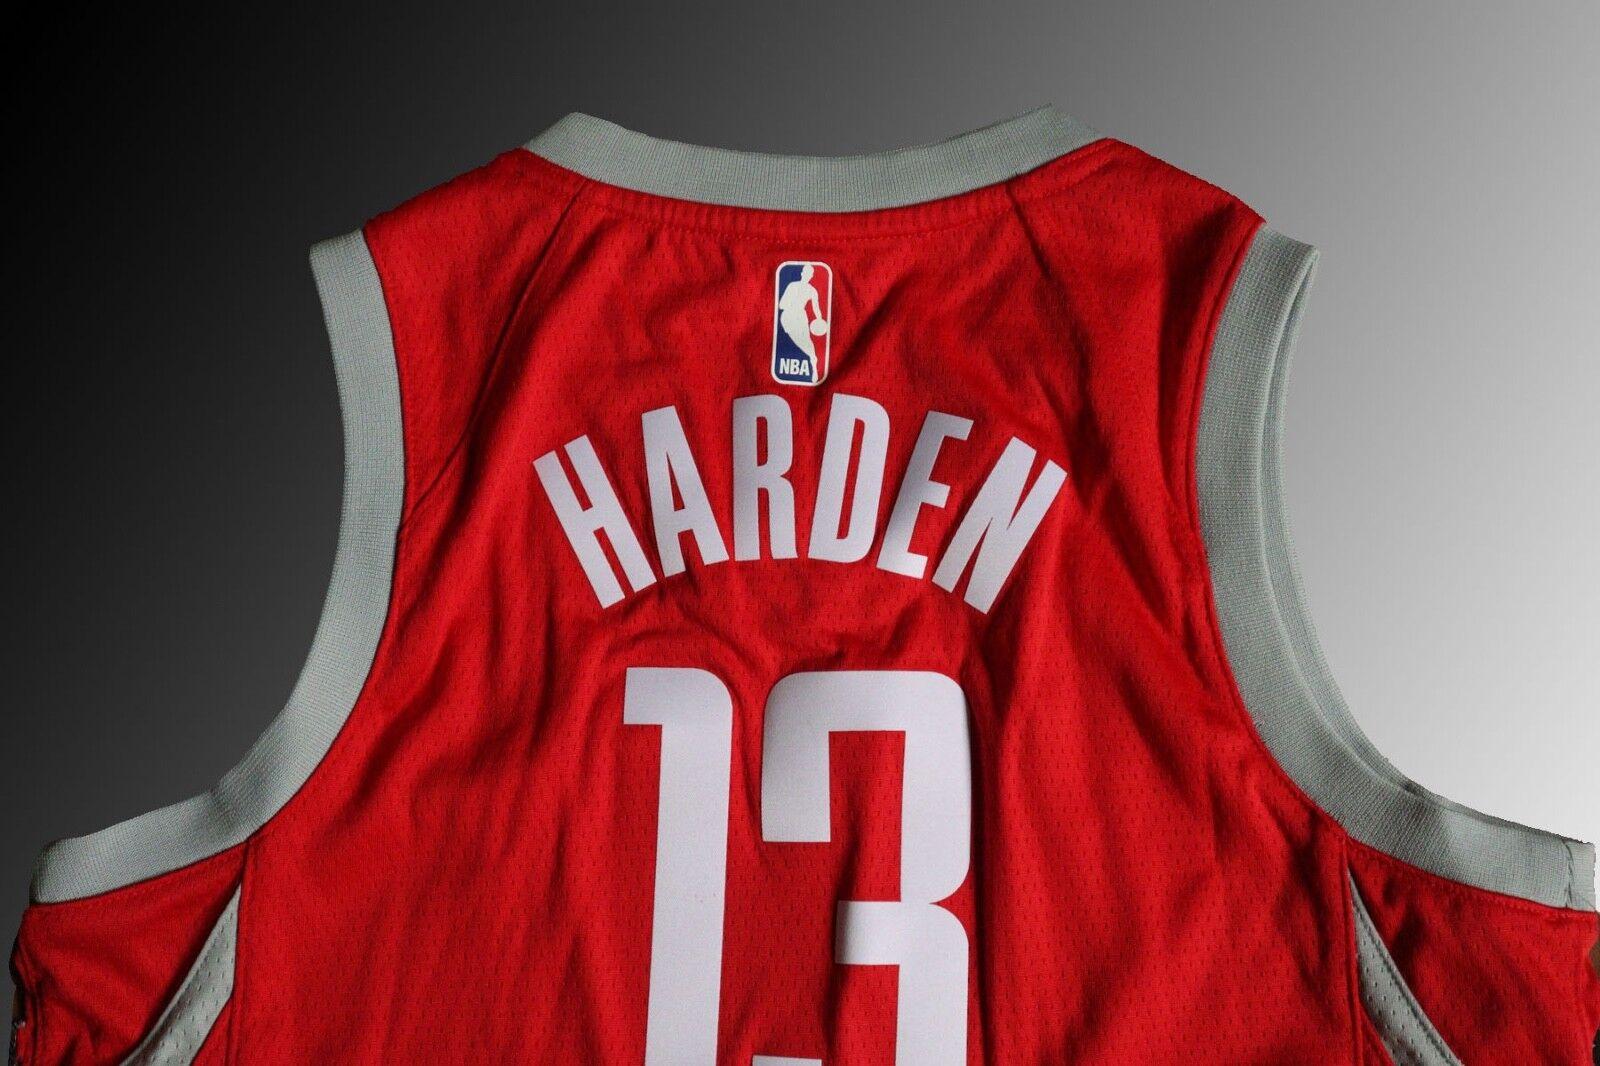 d490a42c0 Nike Youth Houston Rockets James Harden Swingman Jersey NBA City ...